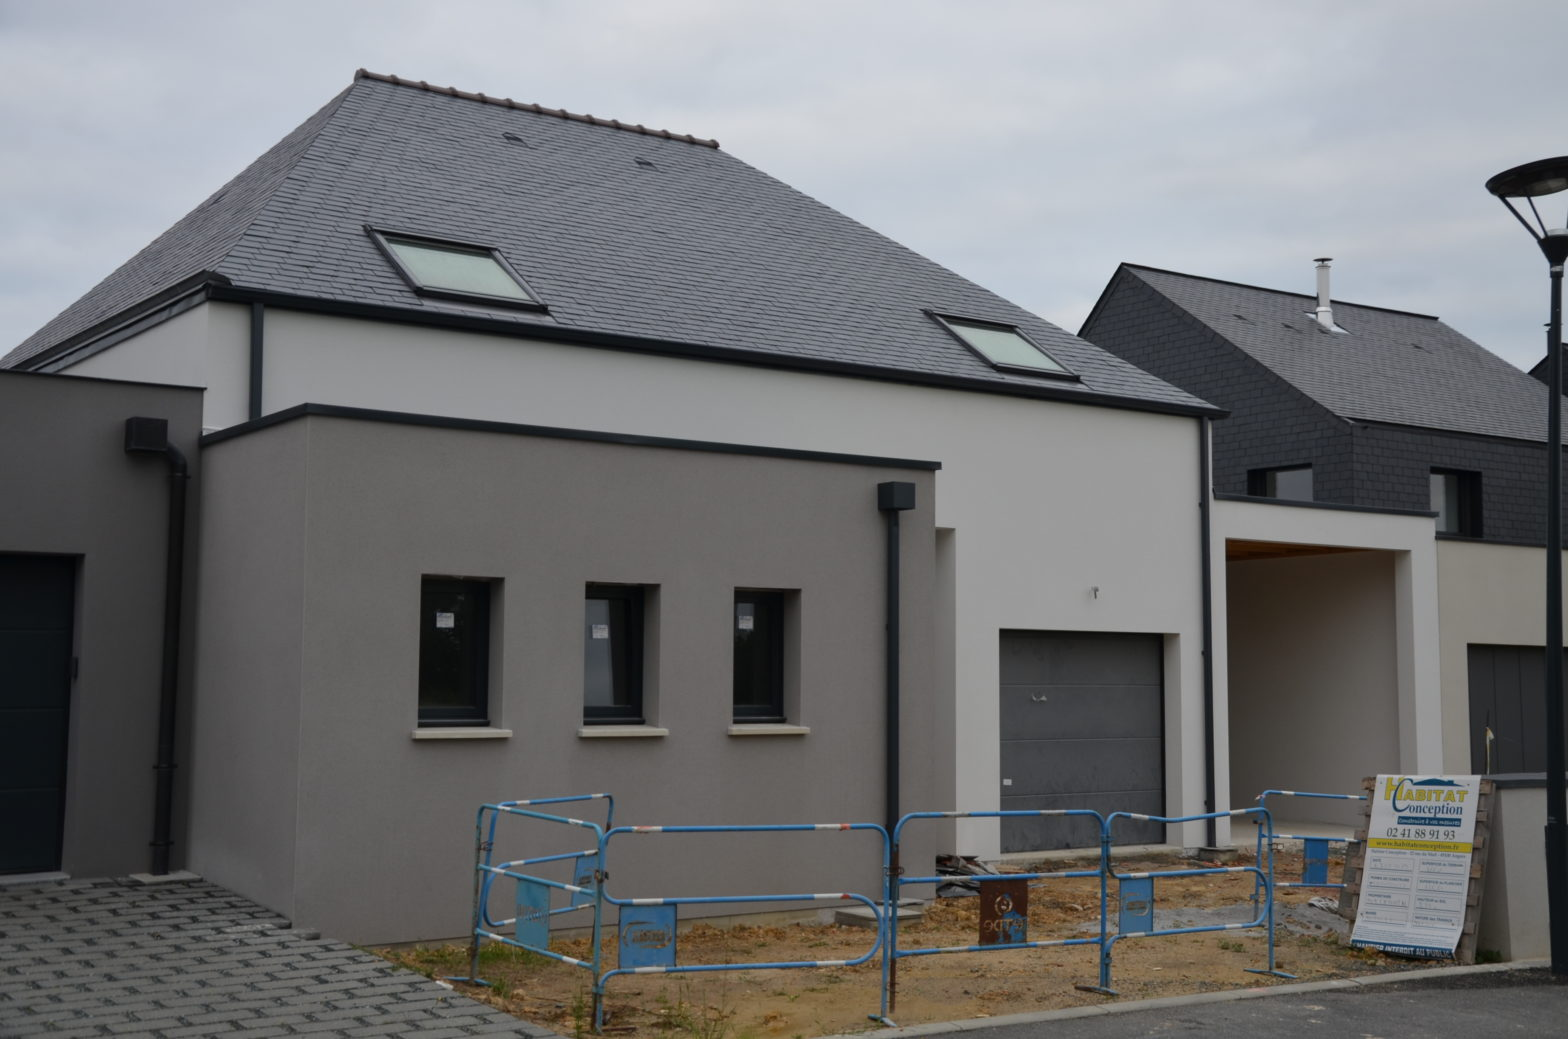 maison etage r+1 toiture monopente 49125 tierce